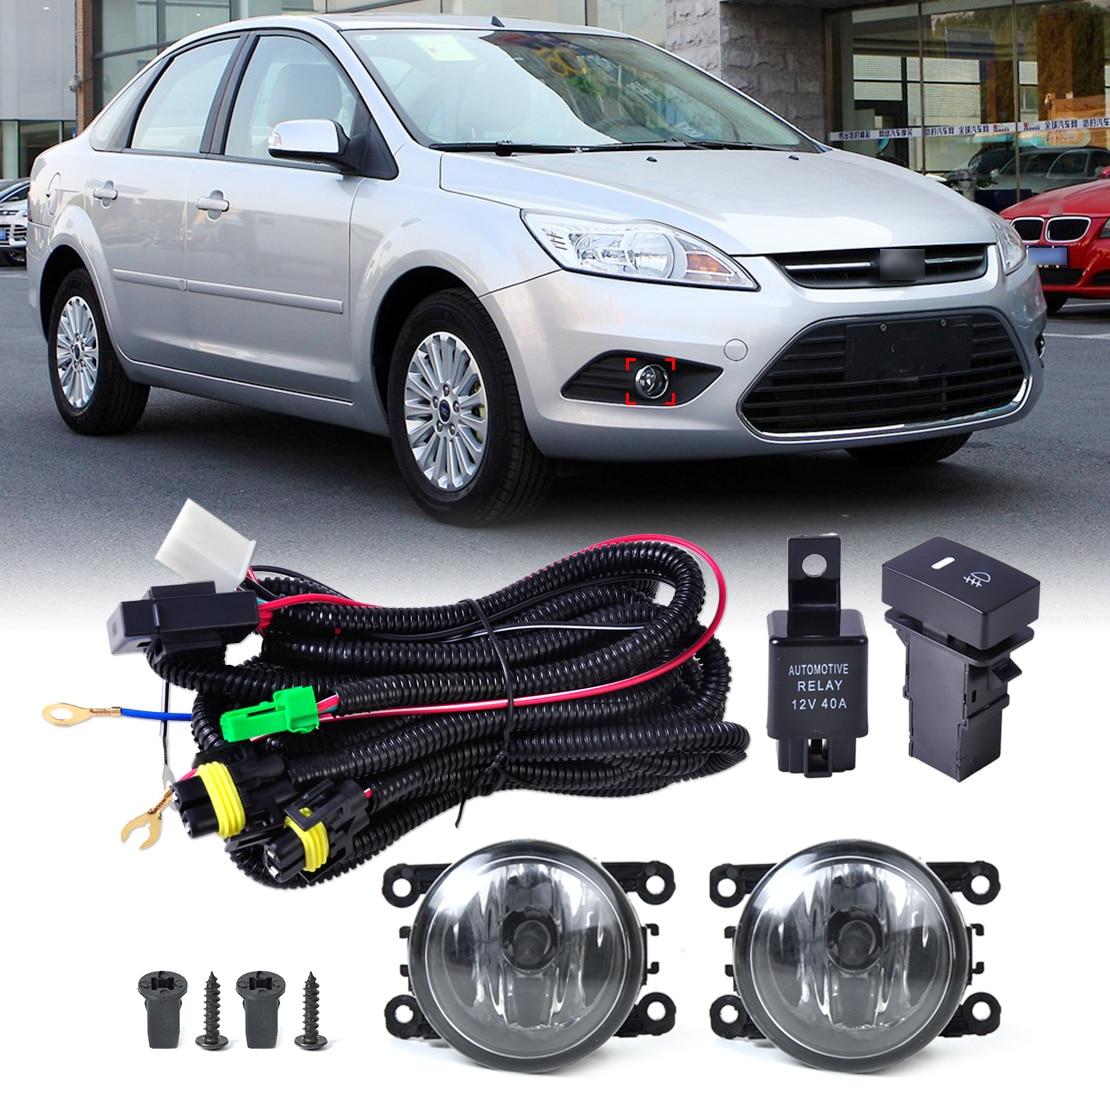 DWCX Wiring Harness Sockets + Switch + 2pcs Fog Lights Lamp 4F9Z-15200-AA for Ford Focus Honda CR-V Acura Nissan Suzuki Subaru ветровик rein для honda cr v iii 2006 2012 кроссовер на накладной скотч 3м 4 шт